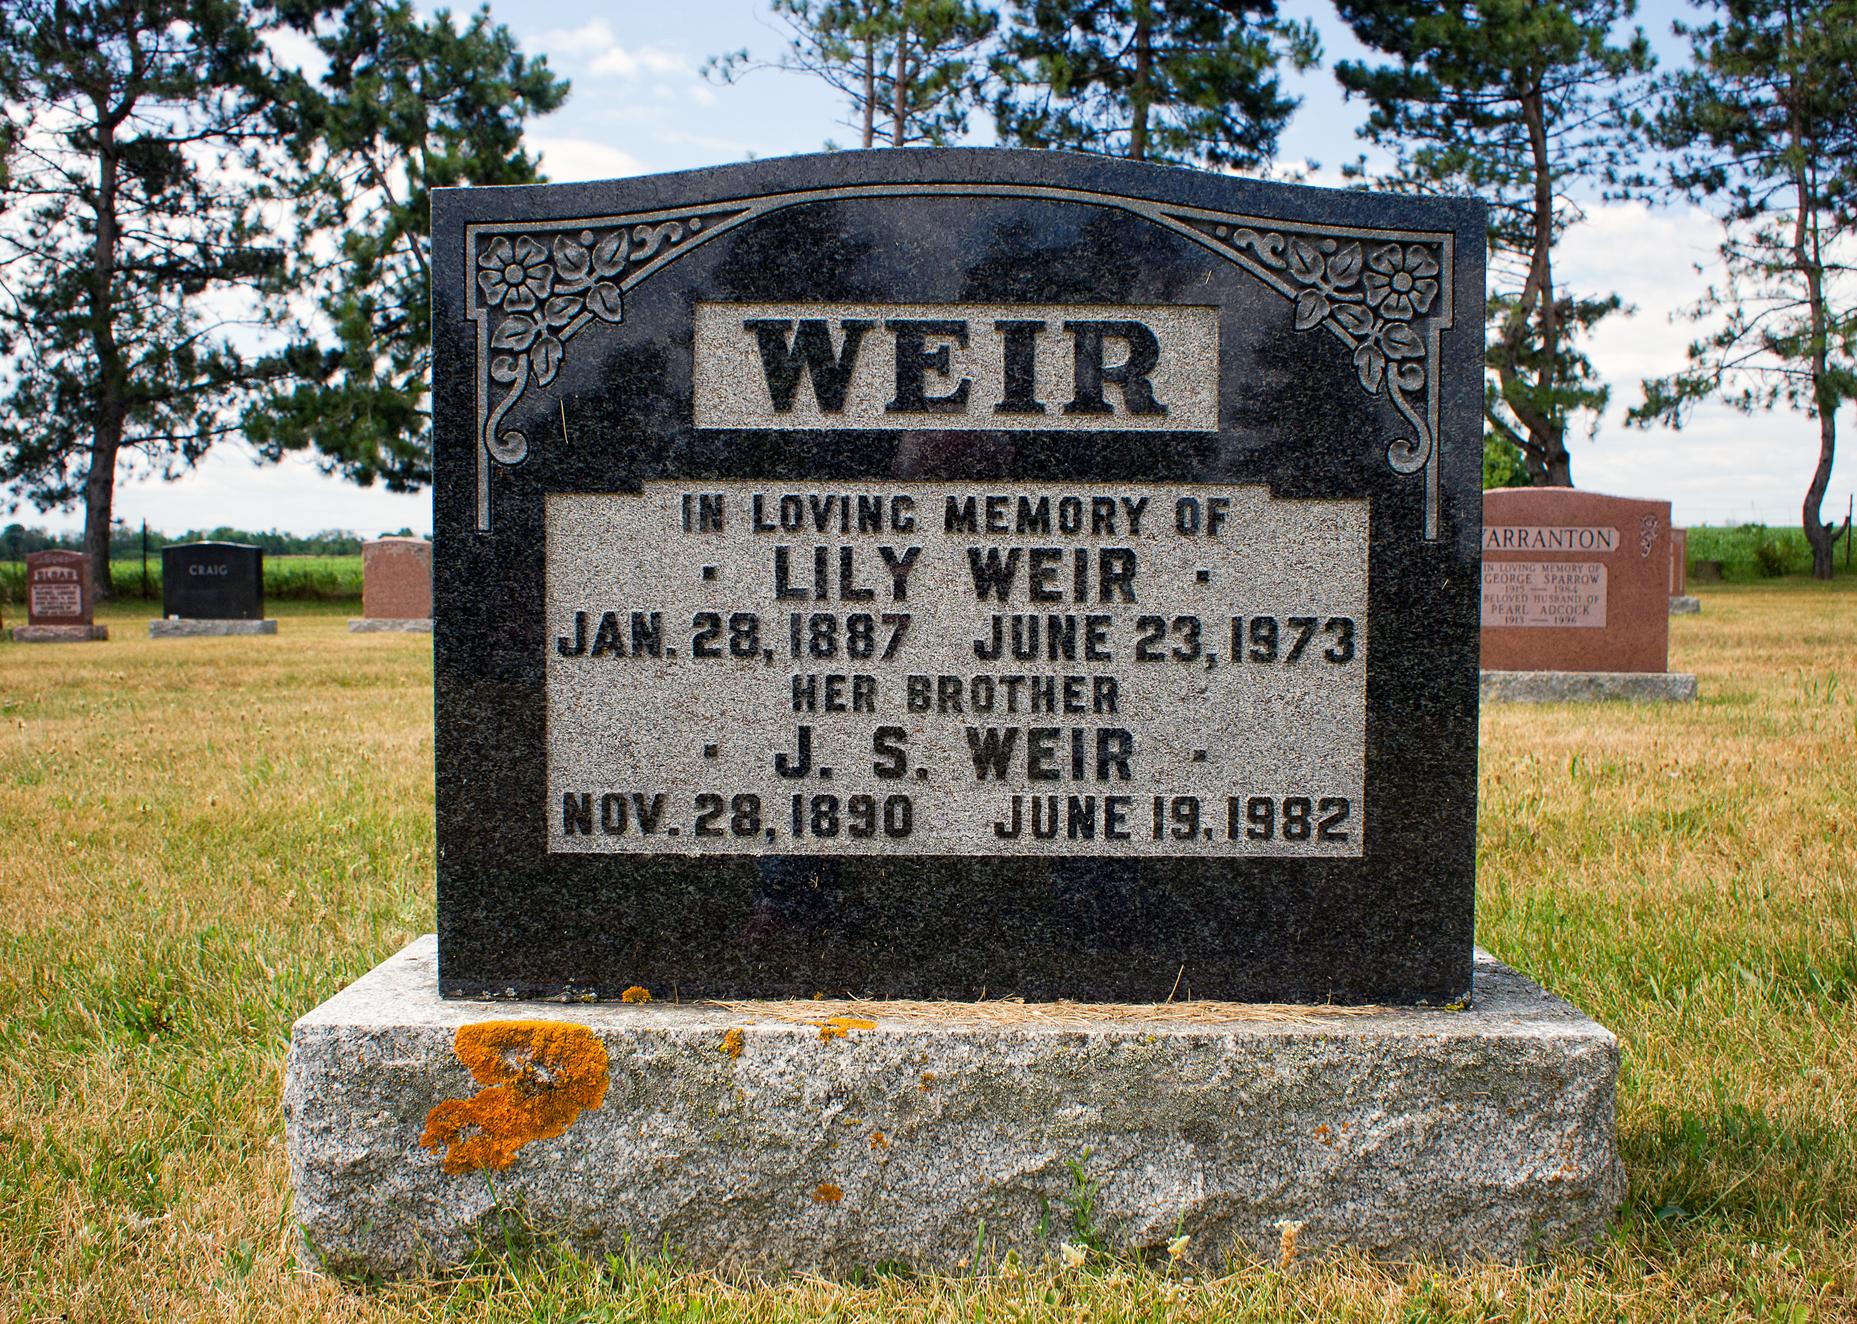 Lily Weir